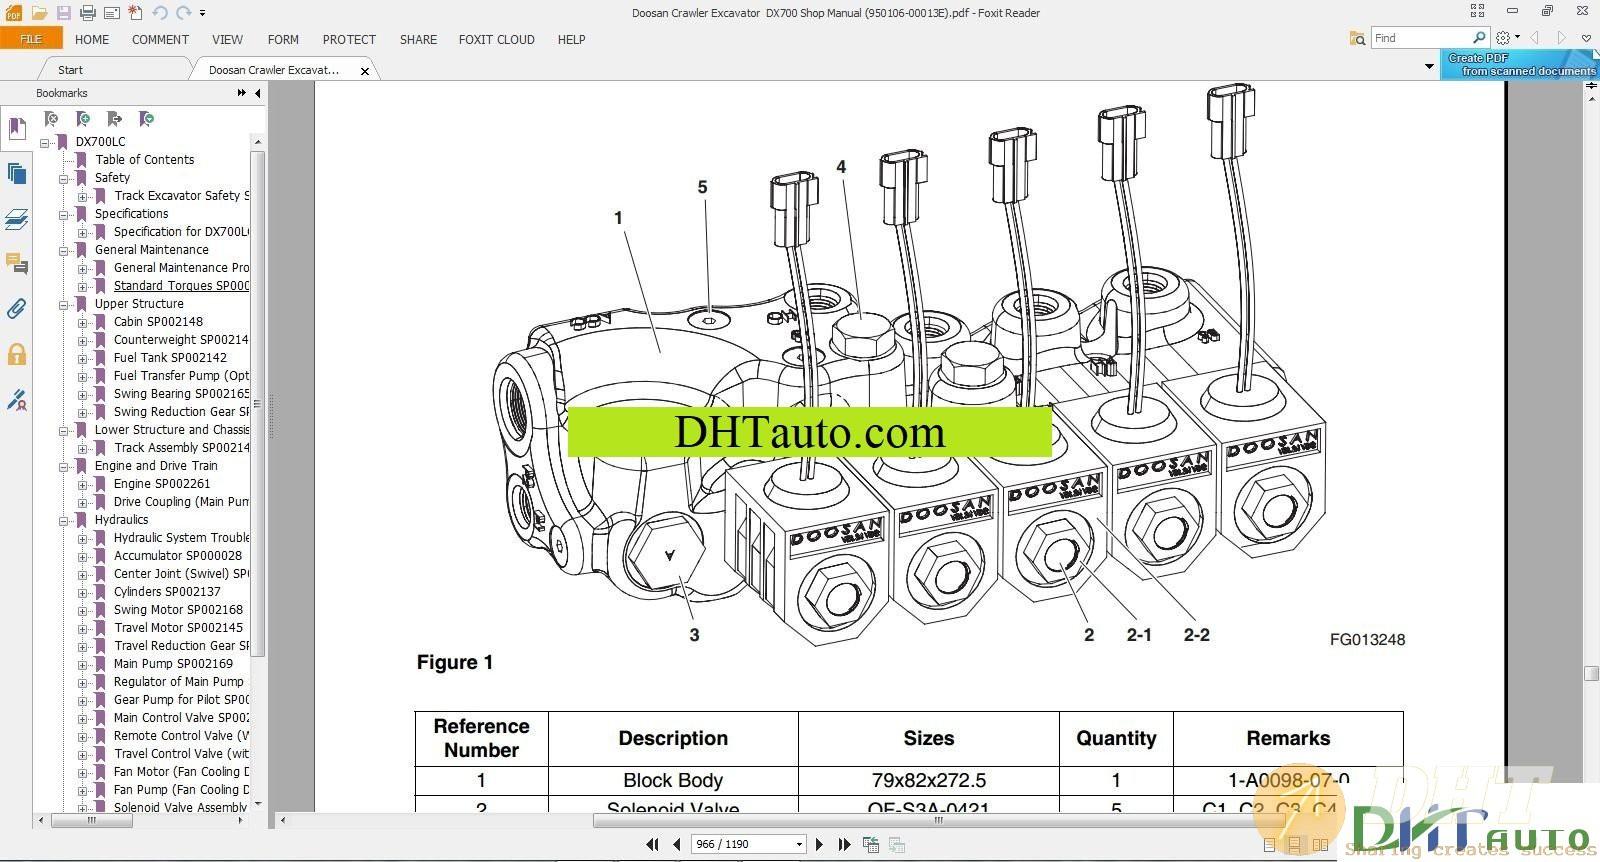 Doosan DX Workshop Manual Full 5.jpg